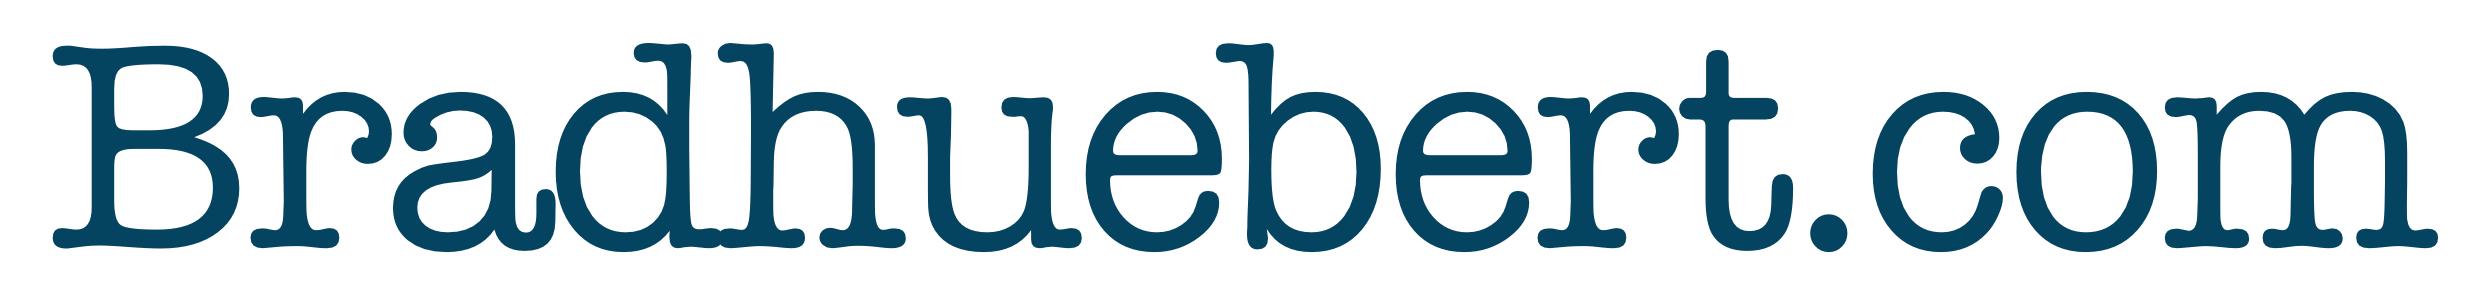 Bradhuebert.com